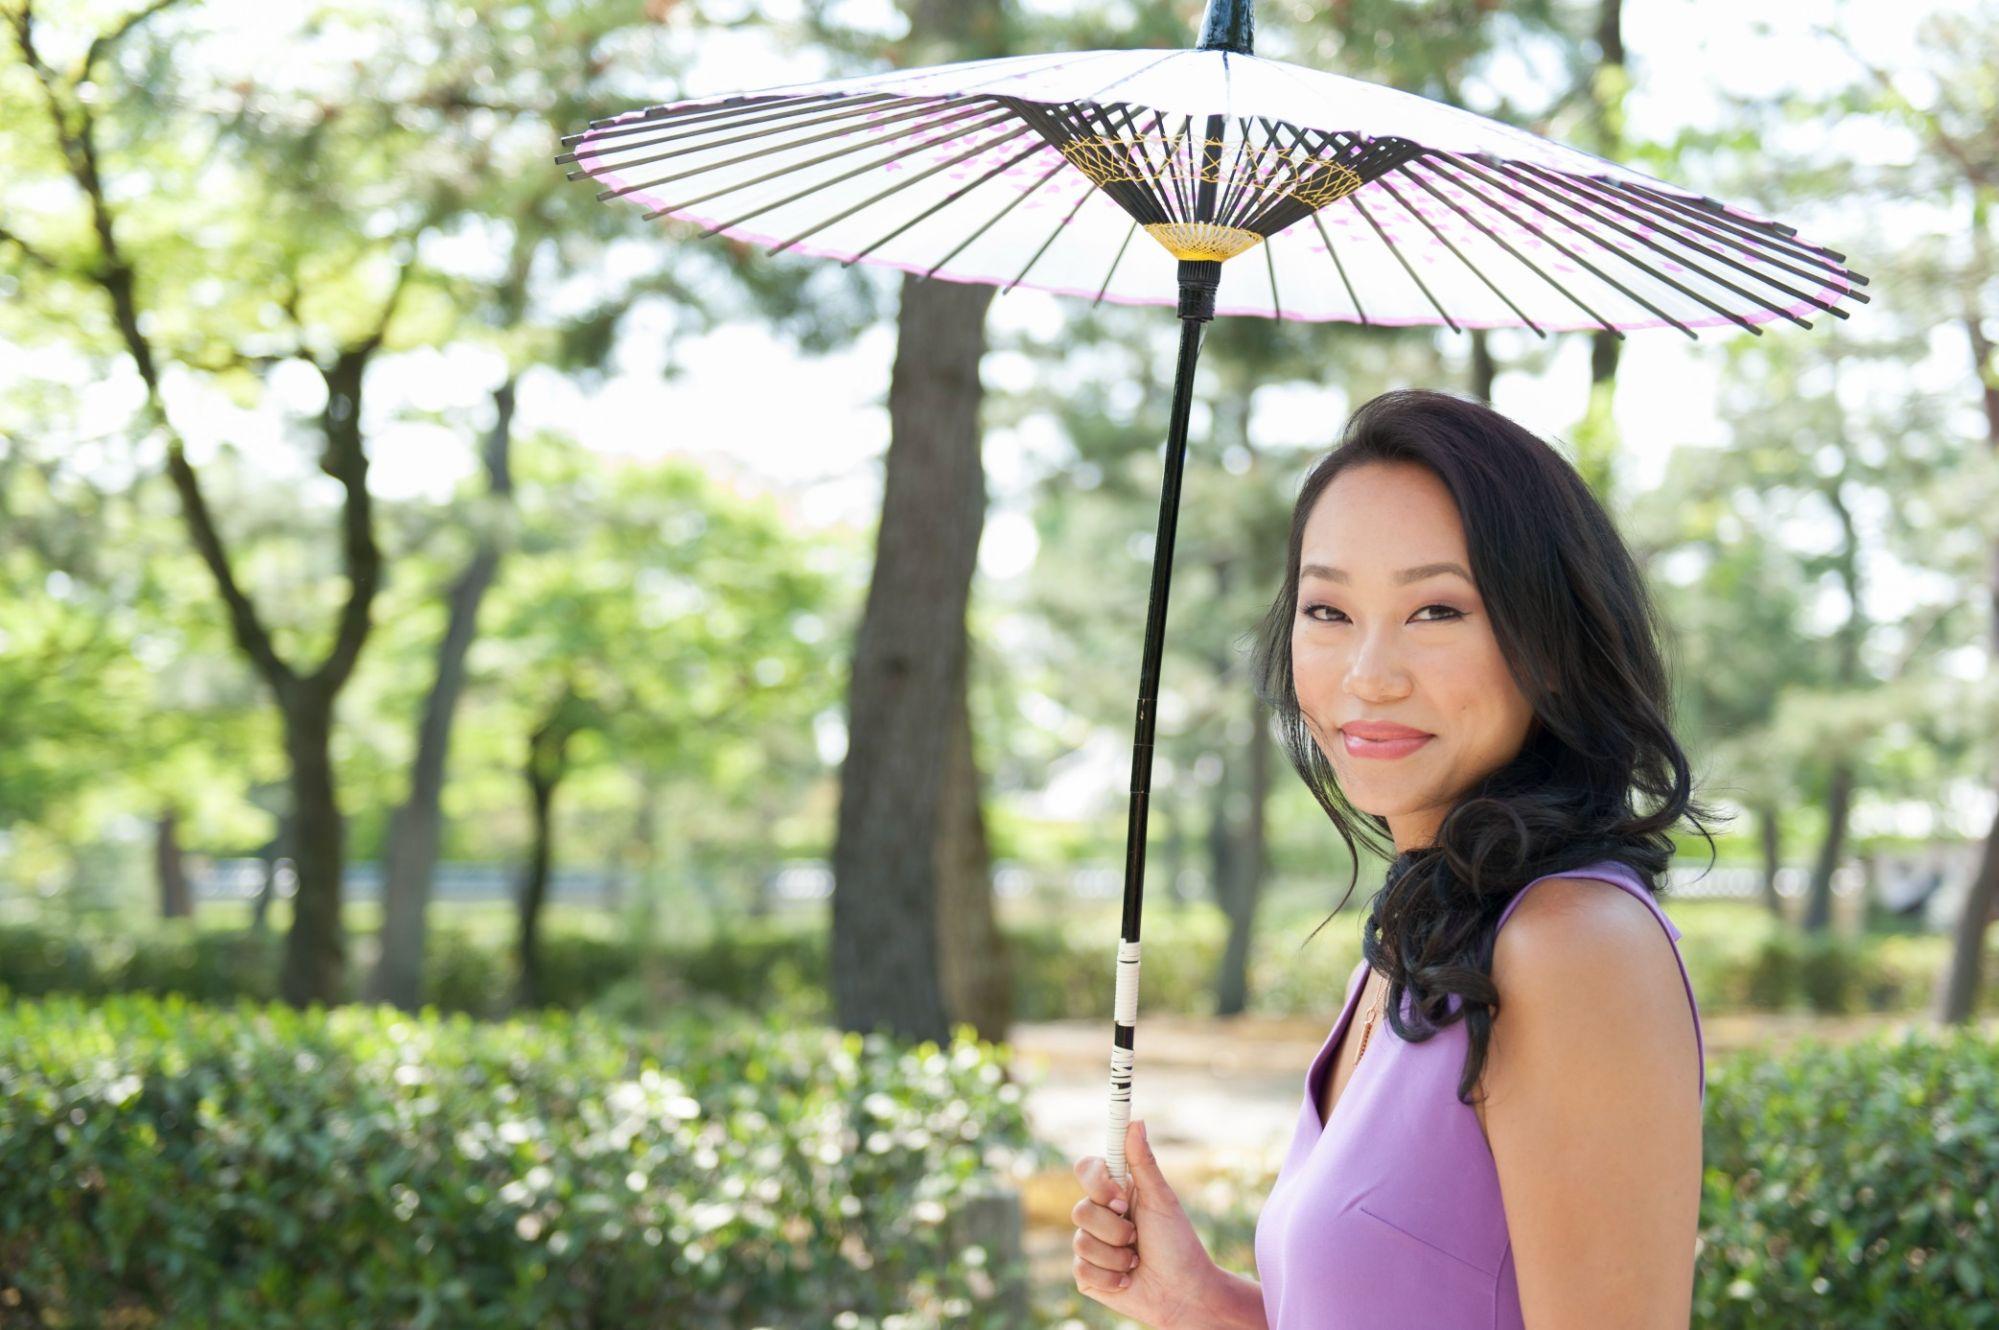 Tatcha founder Vicky Tsai skincare tips during covid-19